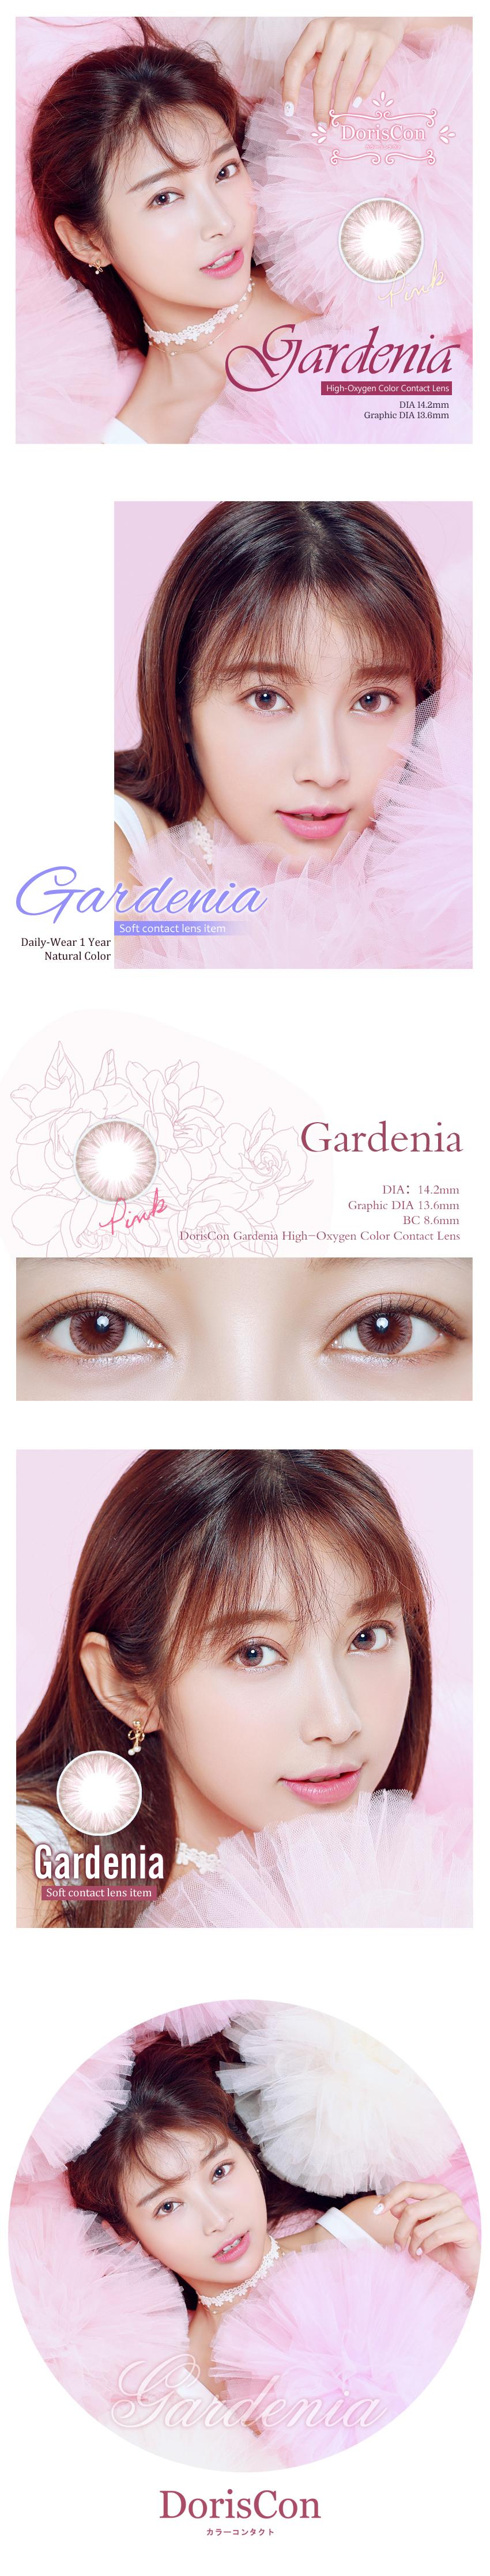 gardeniapink.jpg